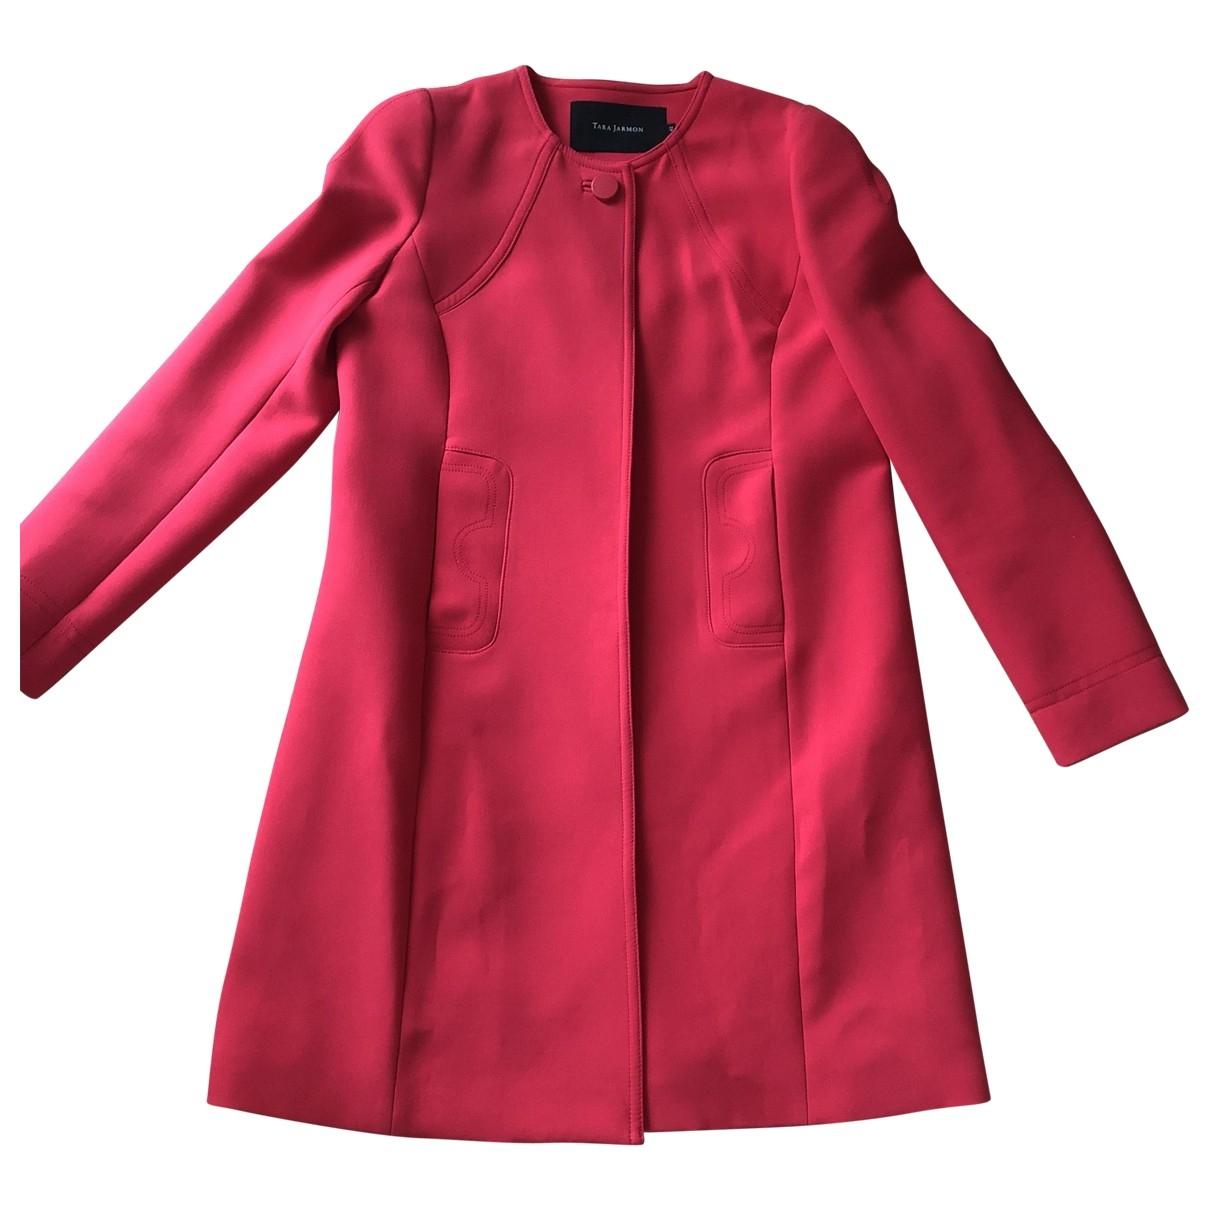 Tara Jarmon \N Pink coat for Women 42 FR